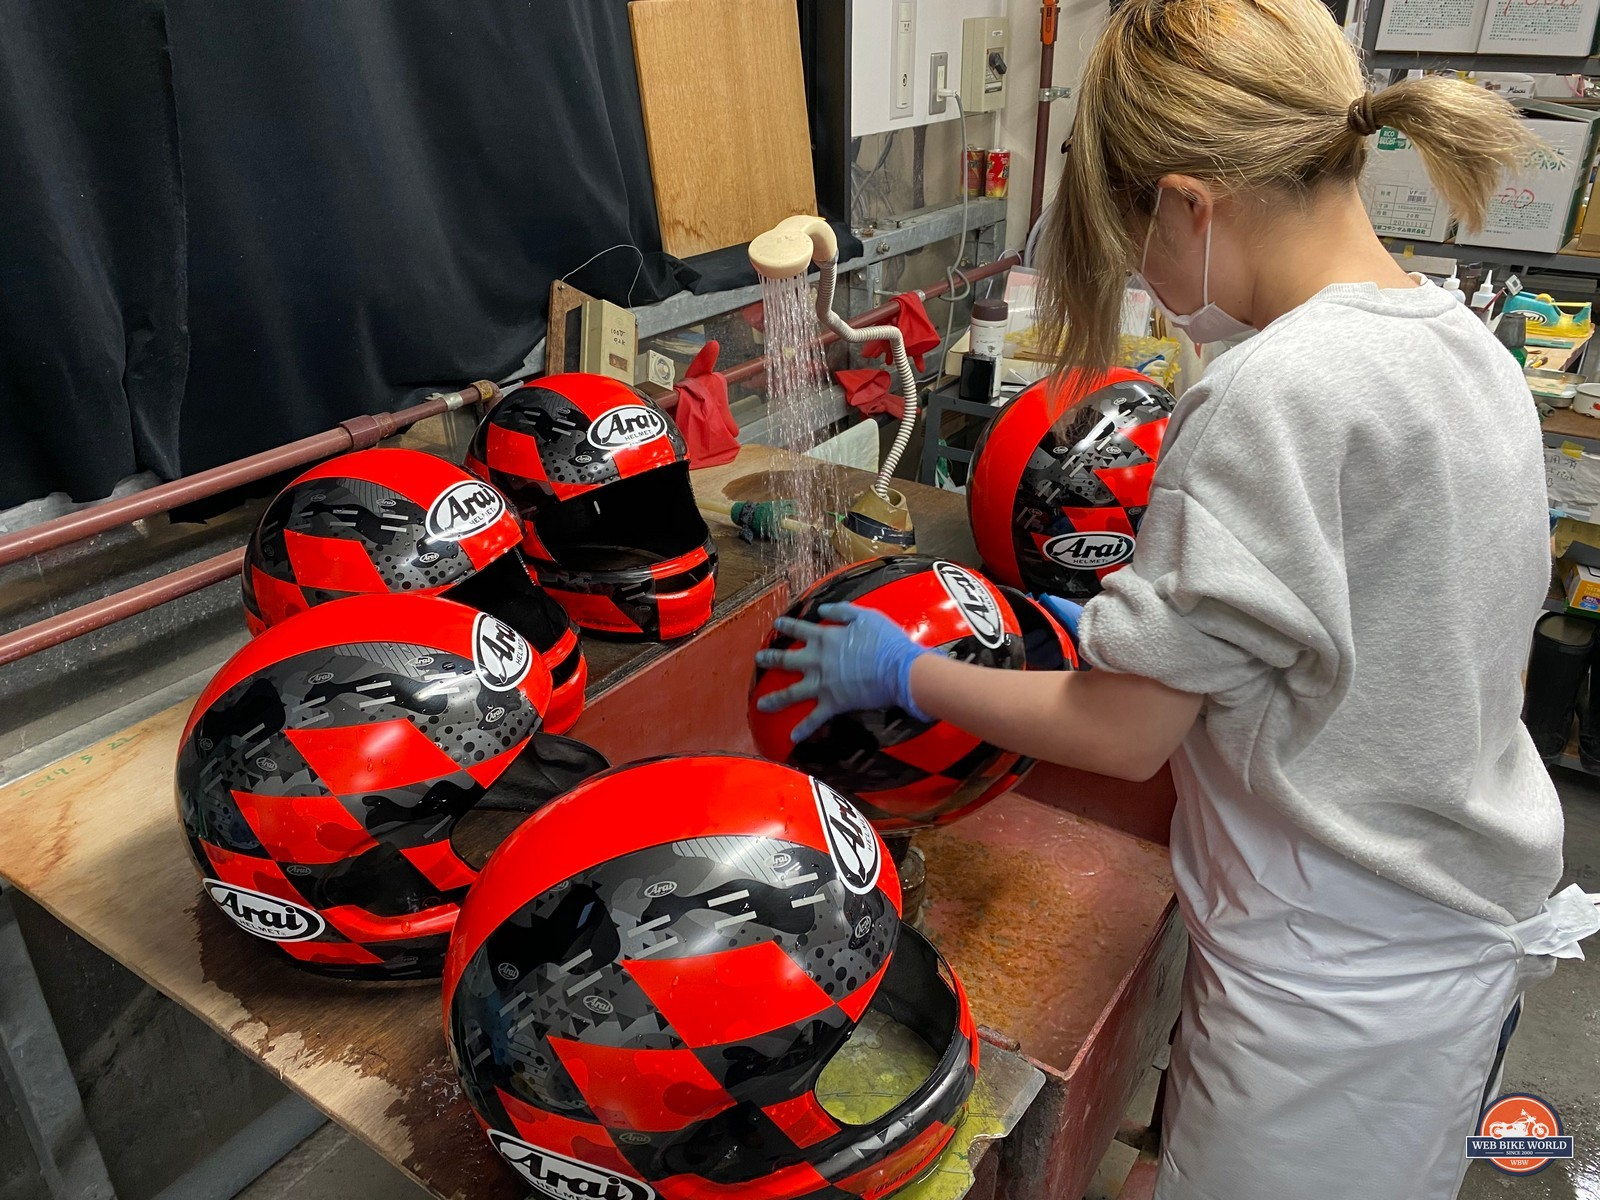 Washing new helmet shells at the Arai helmet factory.